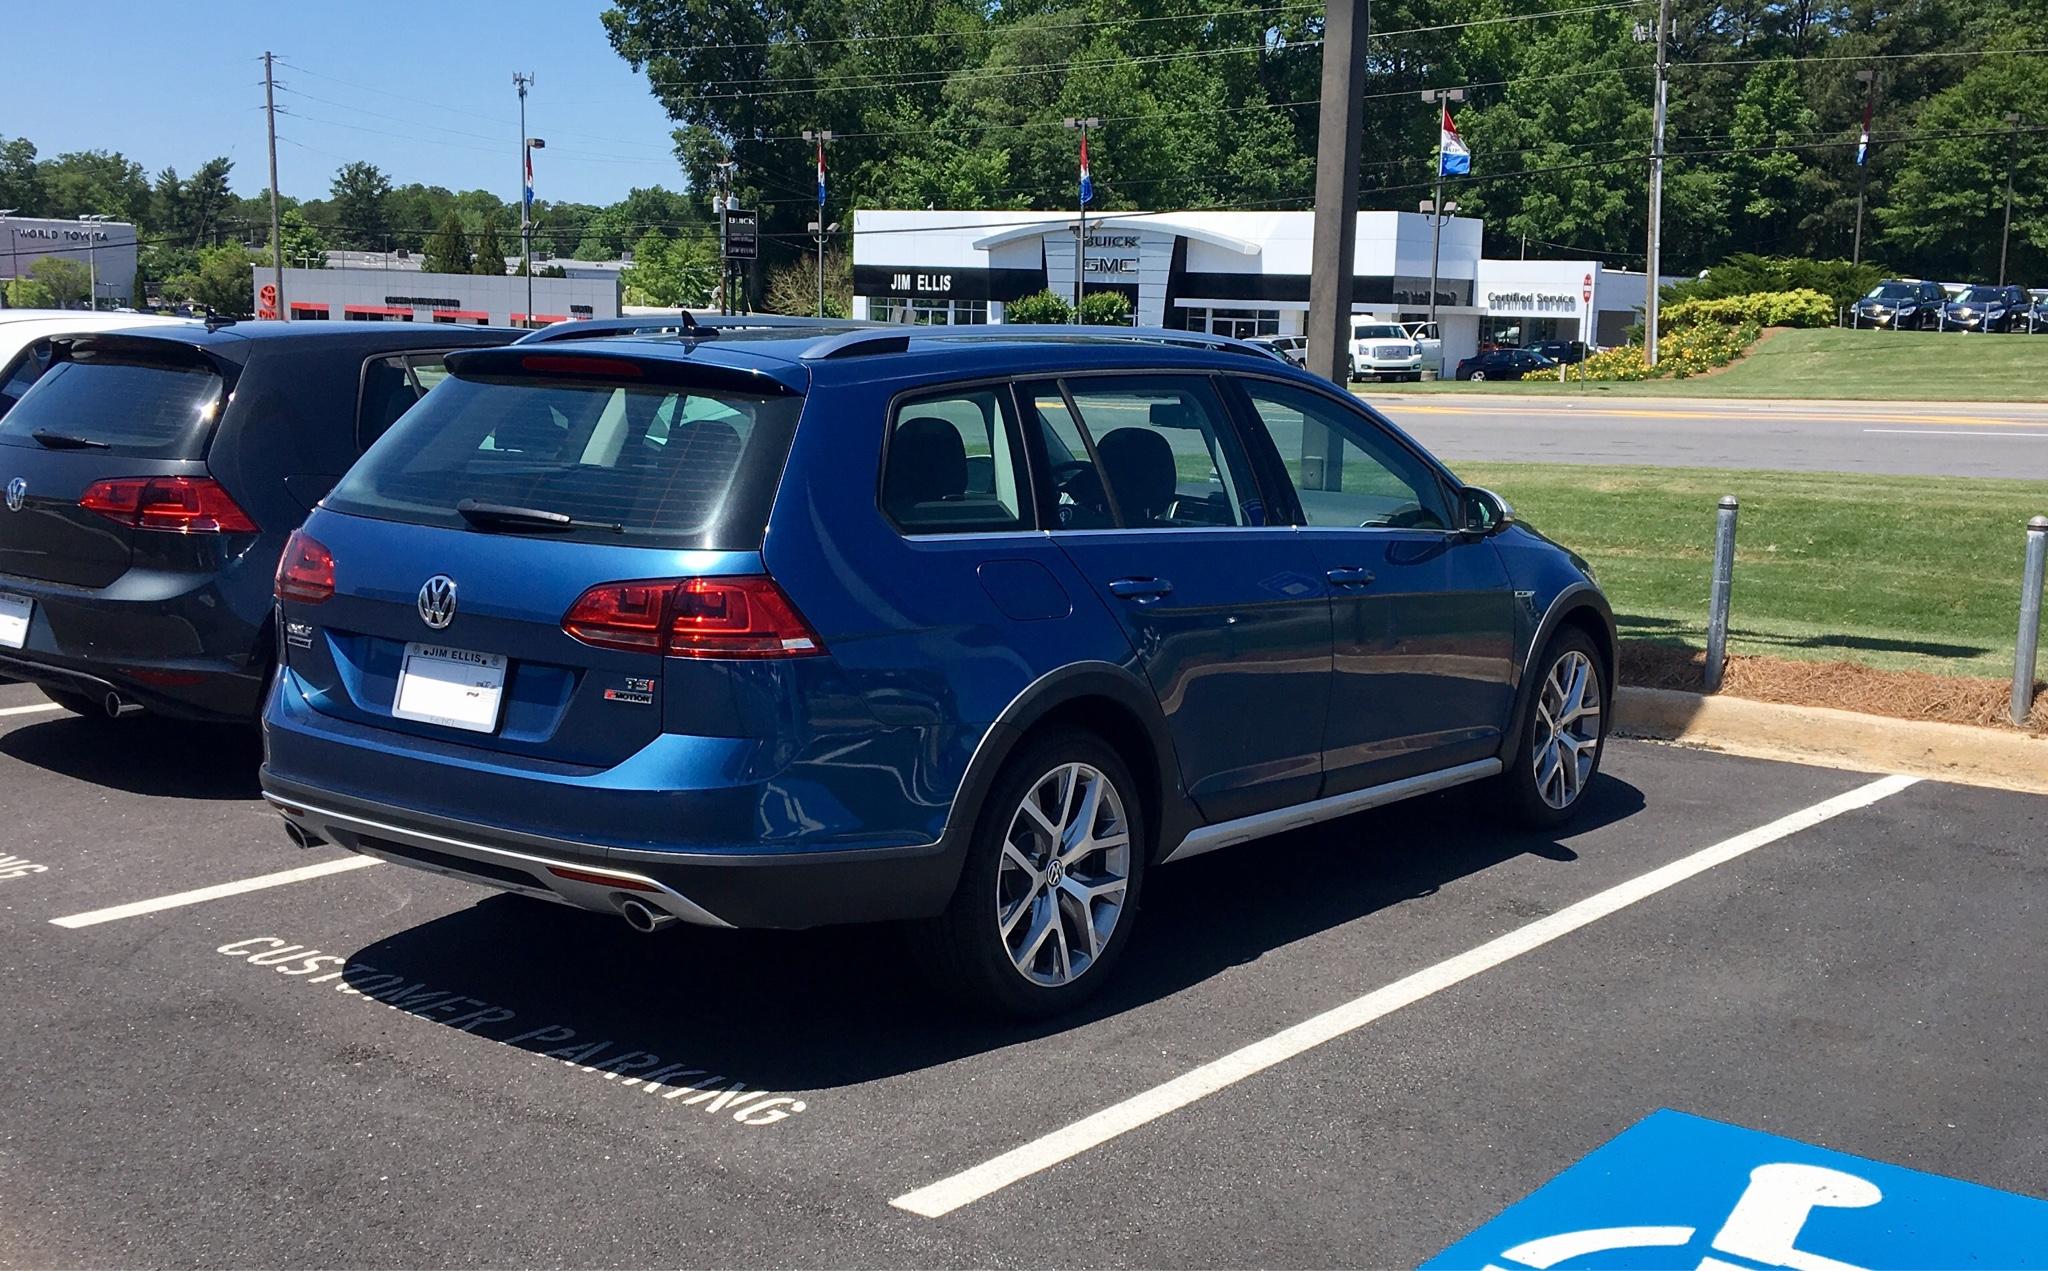 Vwvortex Com New Car Purchase Lifted Turbo Wagon Edition